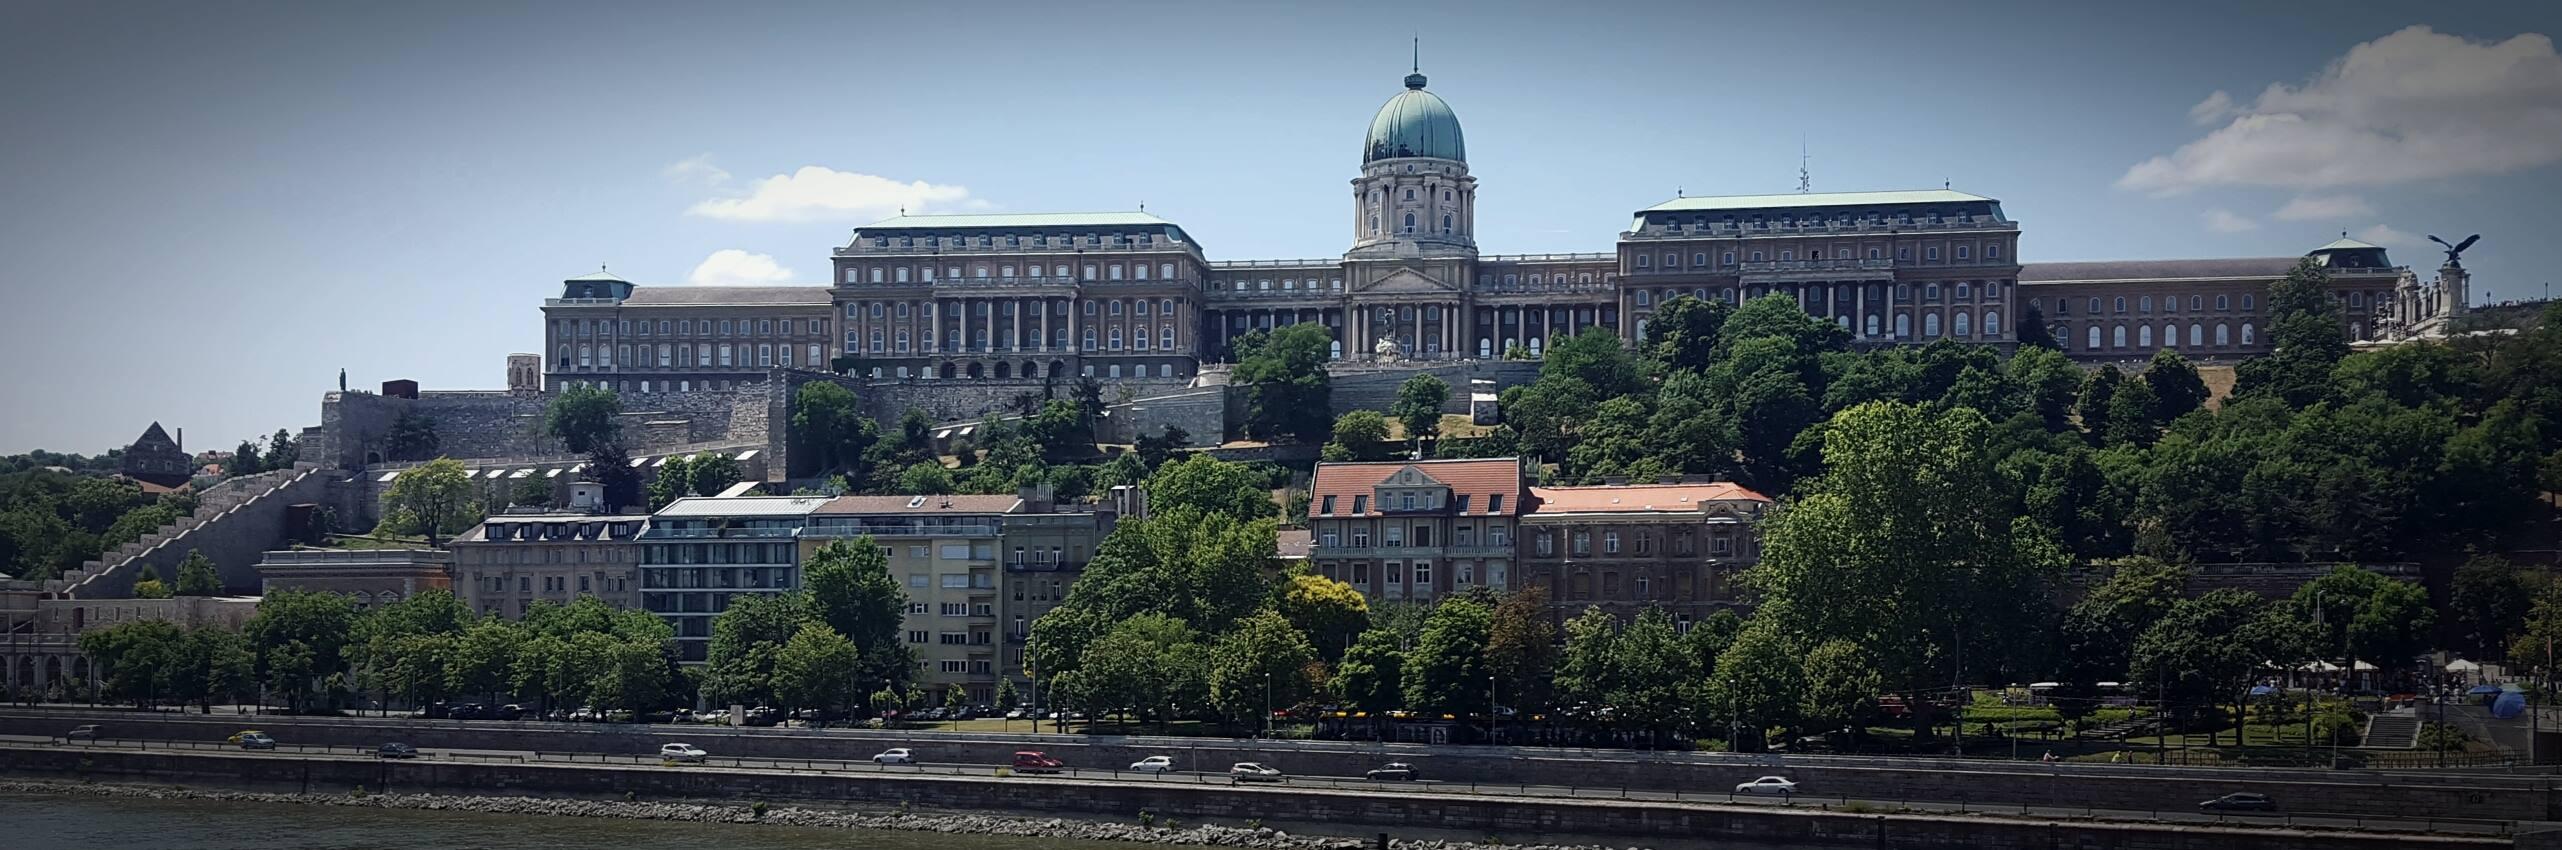 Château (ou Palais) de Buda